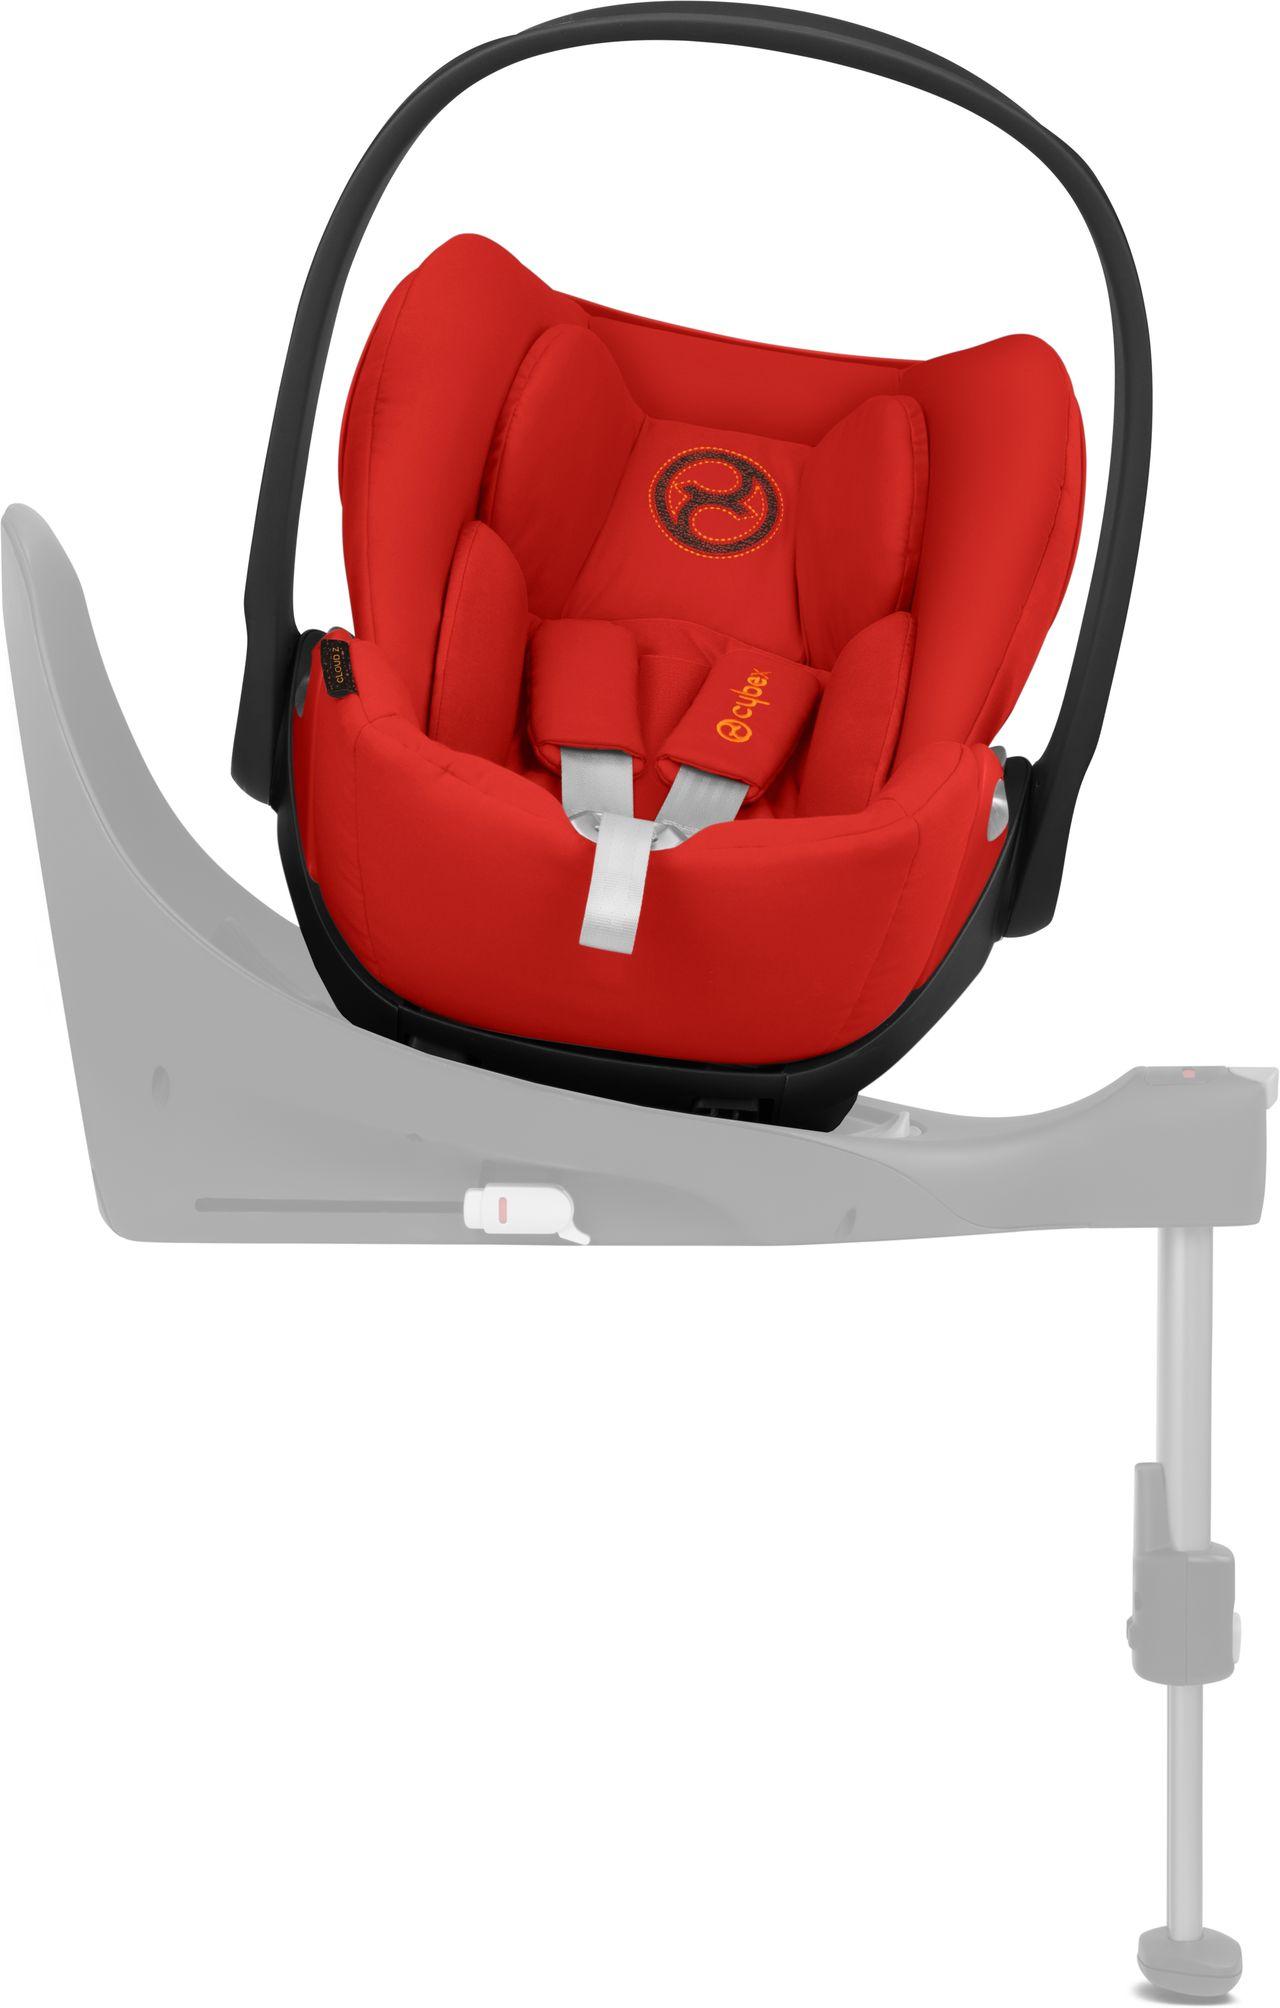 Babyschale Cybex Cloud Z i-Size in Berlin kaufen - Kleine Fabriek